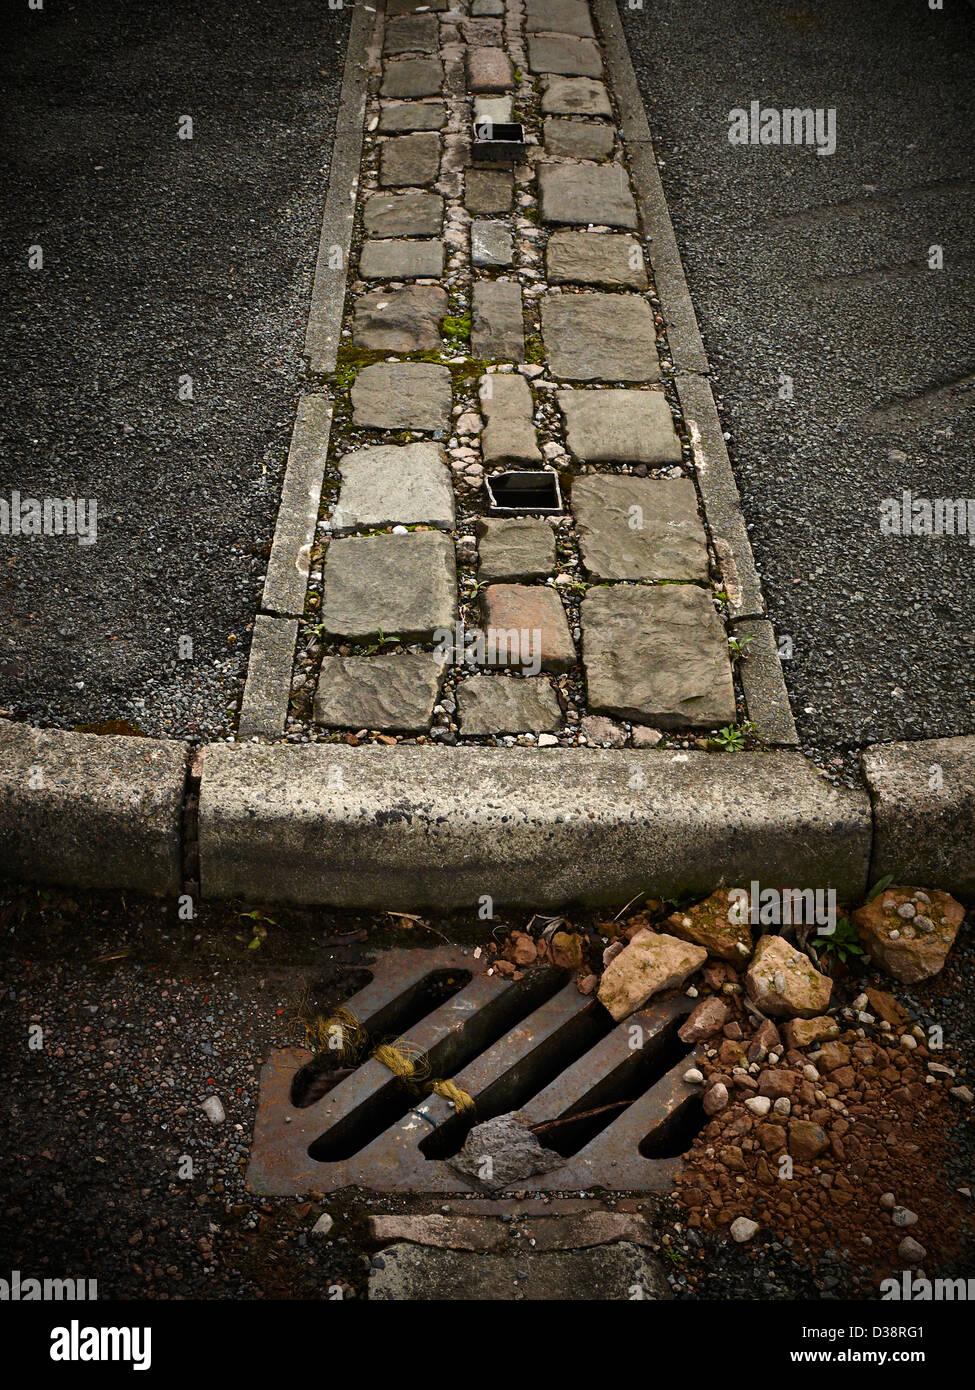 Manhole in street - Stock Image